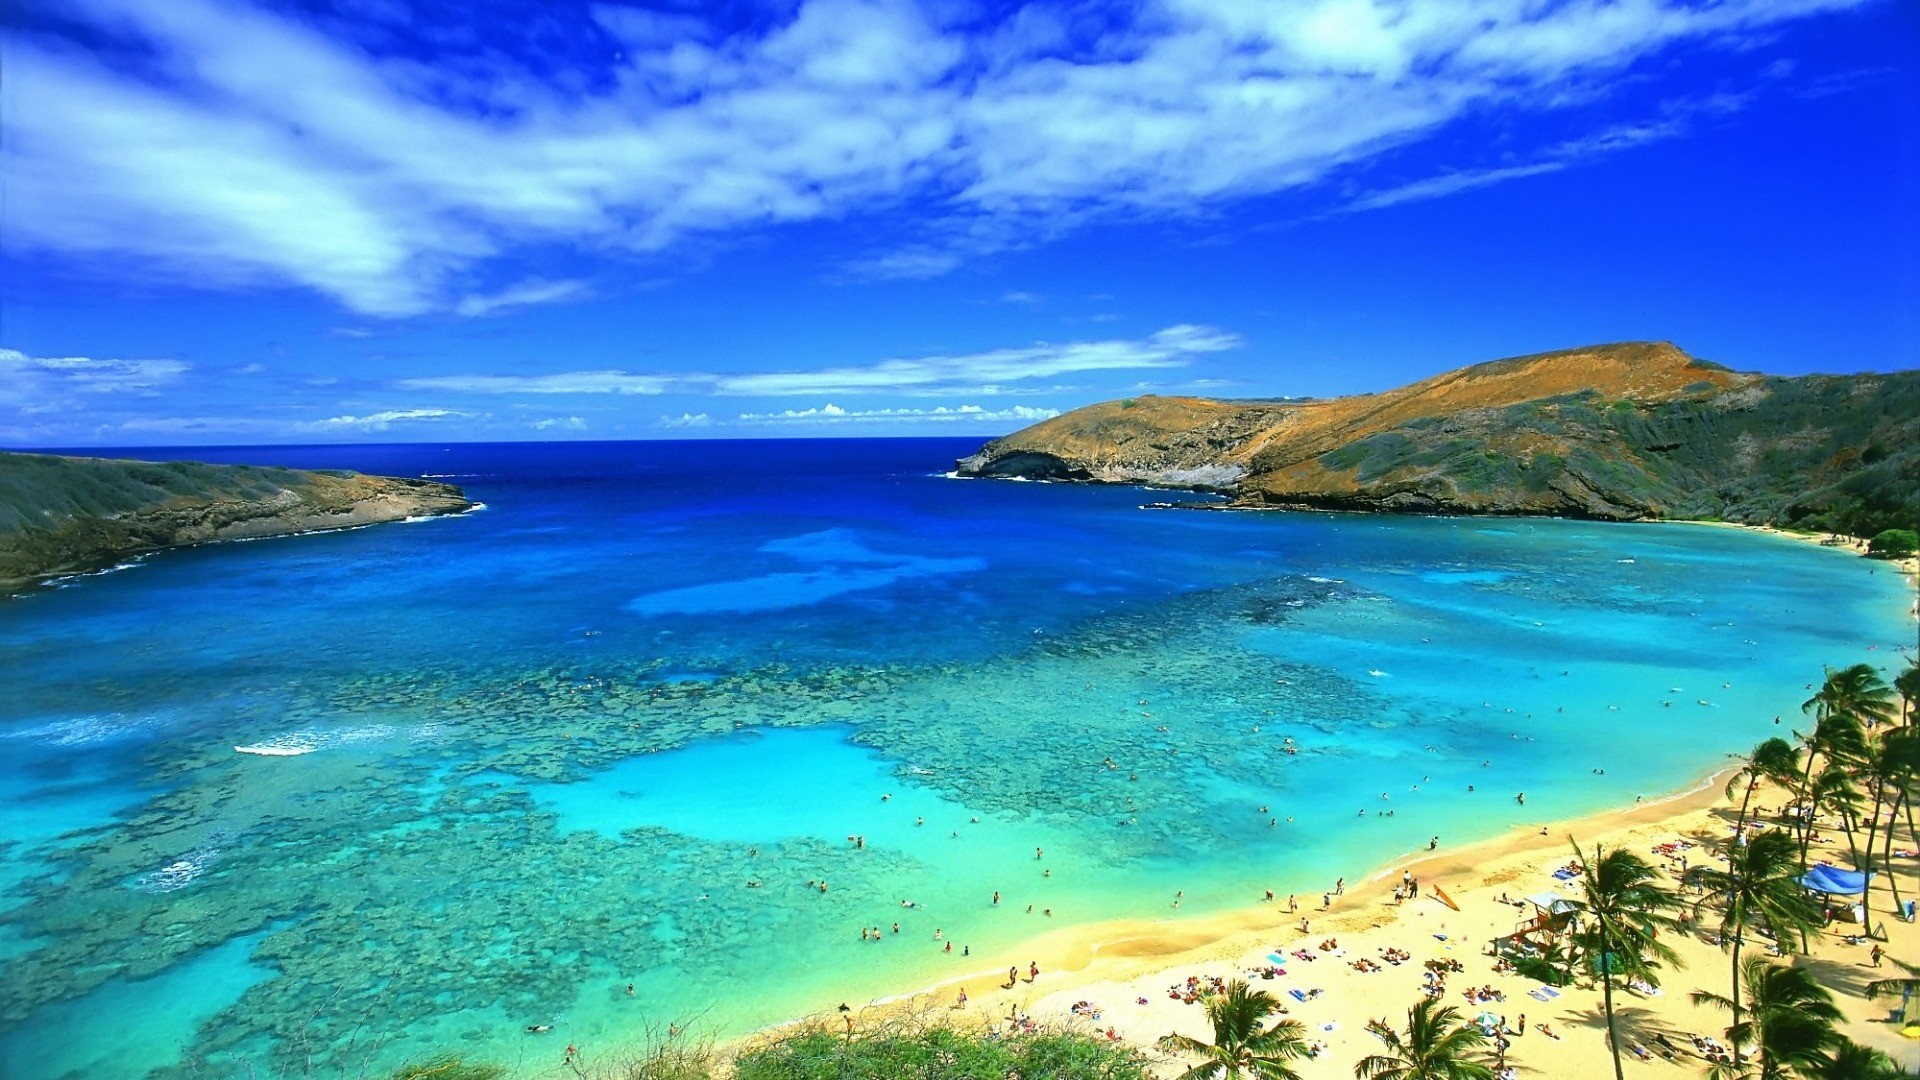 Hd Tropical Island Beach Paradise Wallpapers And Backgrounds: Beach Paradise Wallpaper ·① WallpaperTag